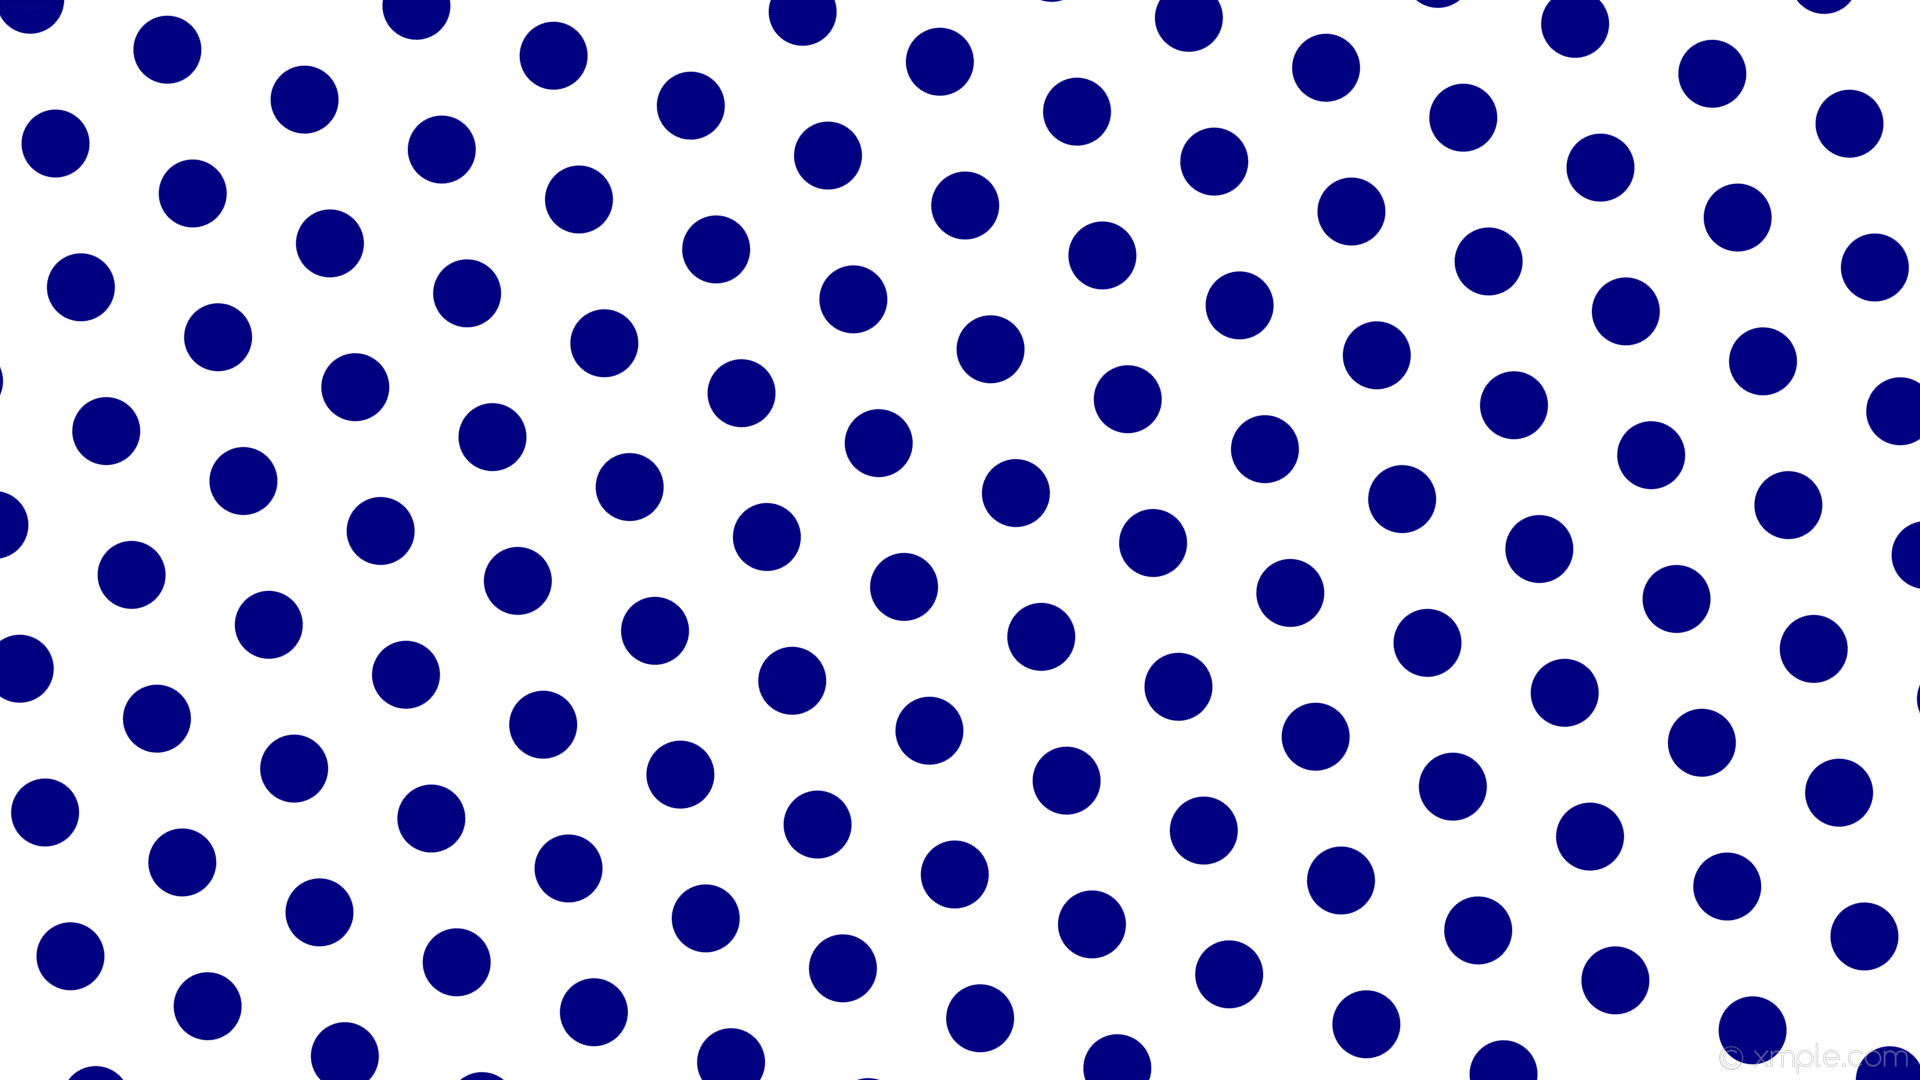 wallpaper white polka dots hexagon blue navy #ffffff #000080 diagonal 40°  68px 146px